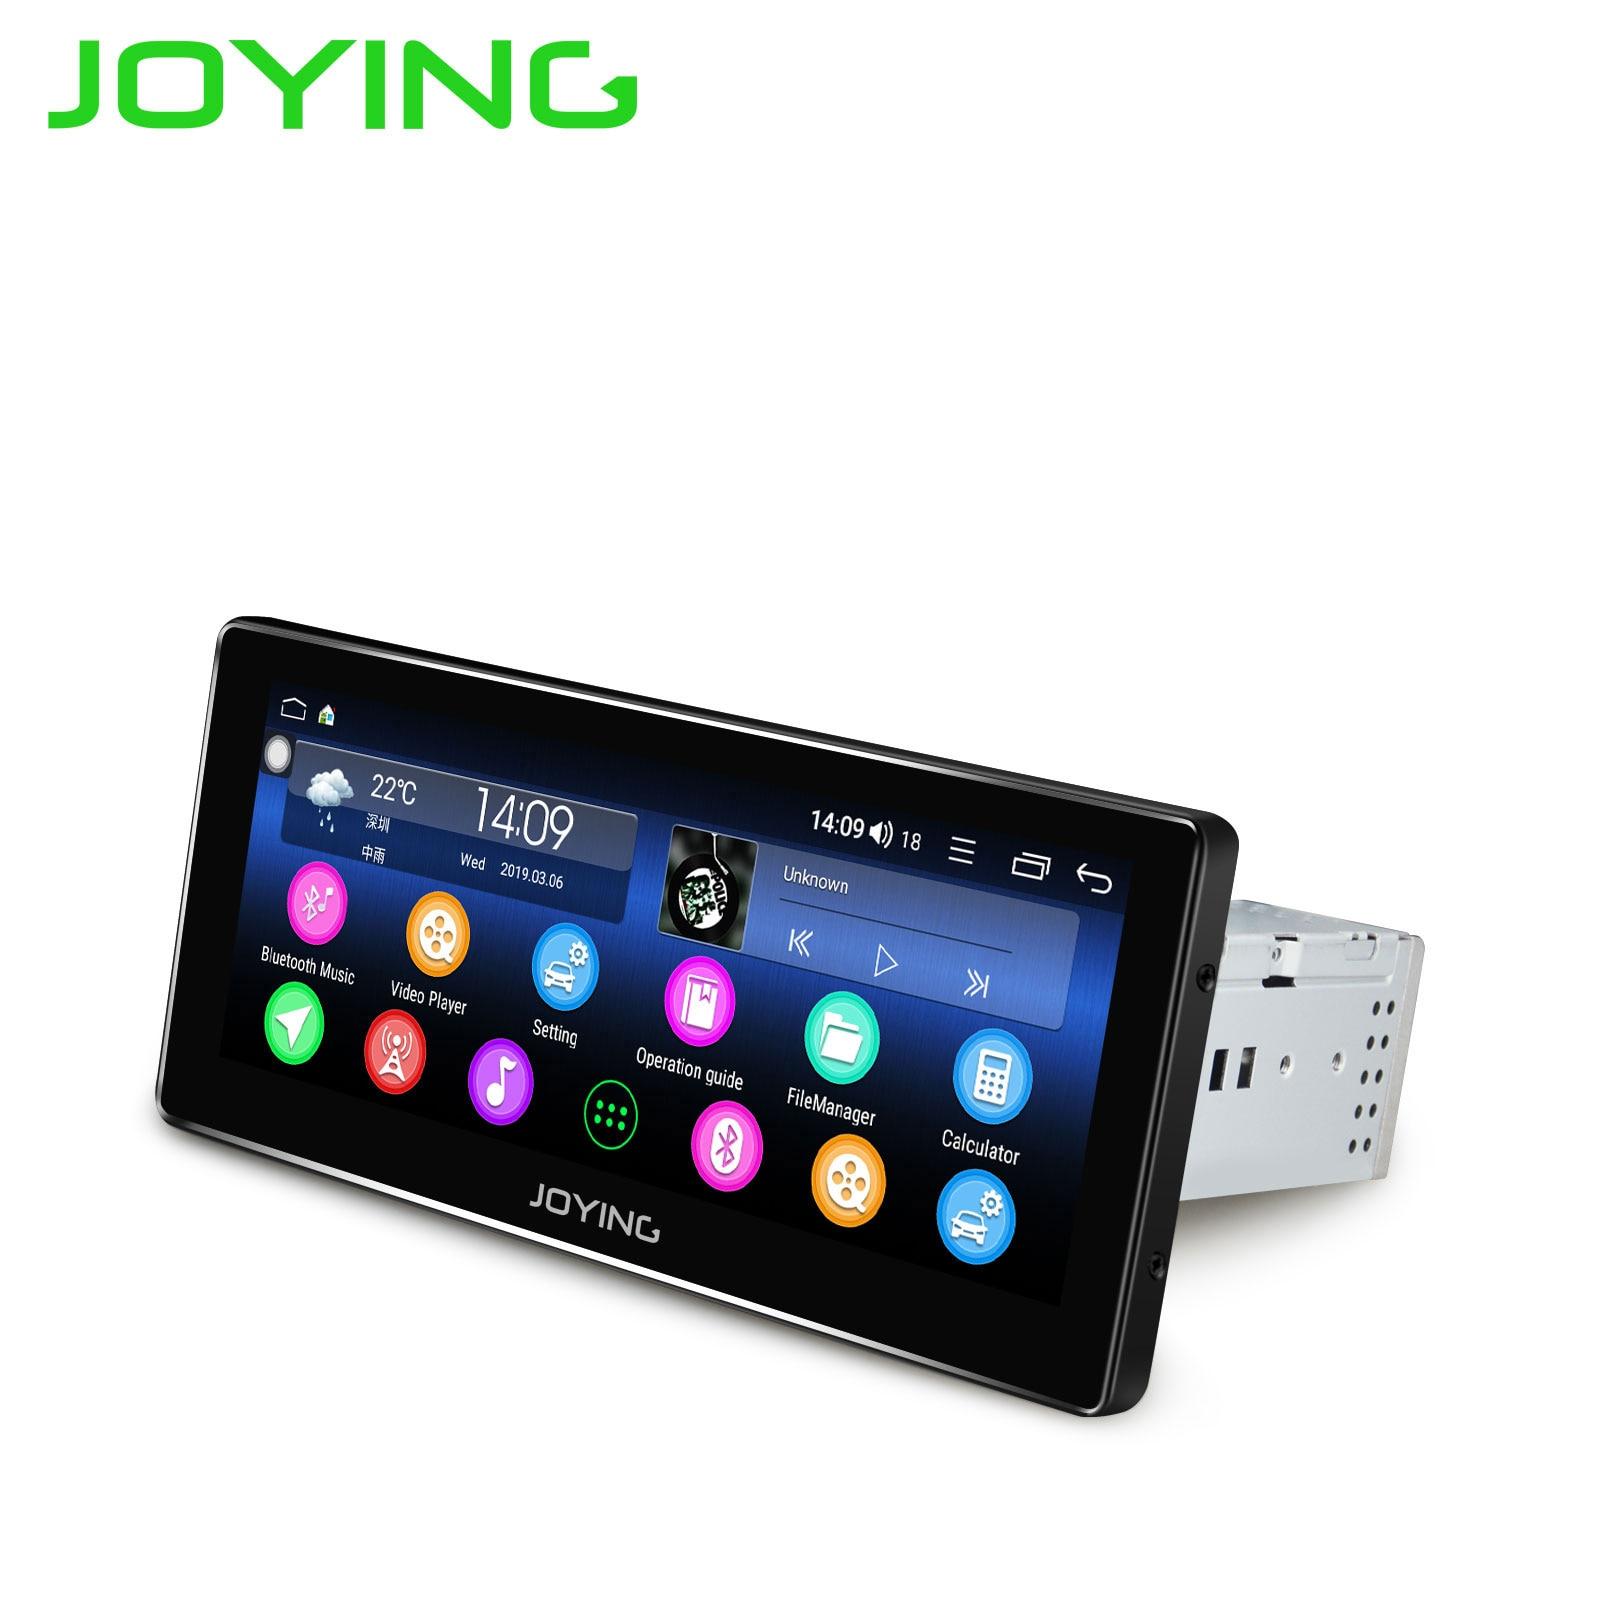 JOYING 8.8 Inch 1280*480 IPS Screen Android 8.1 Octa Core Universal Car Radio Player DSP Audio Stereo BT Music Autoradio SWC HD